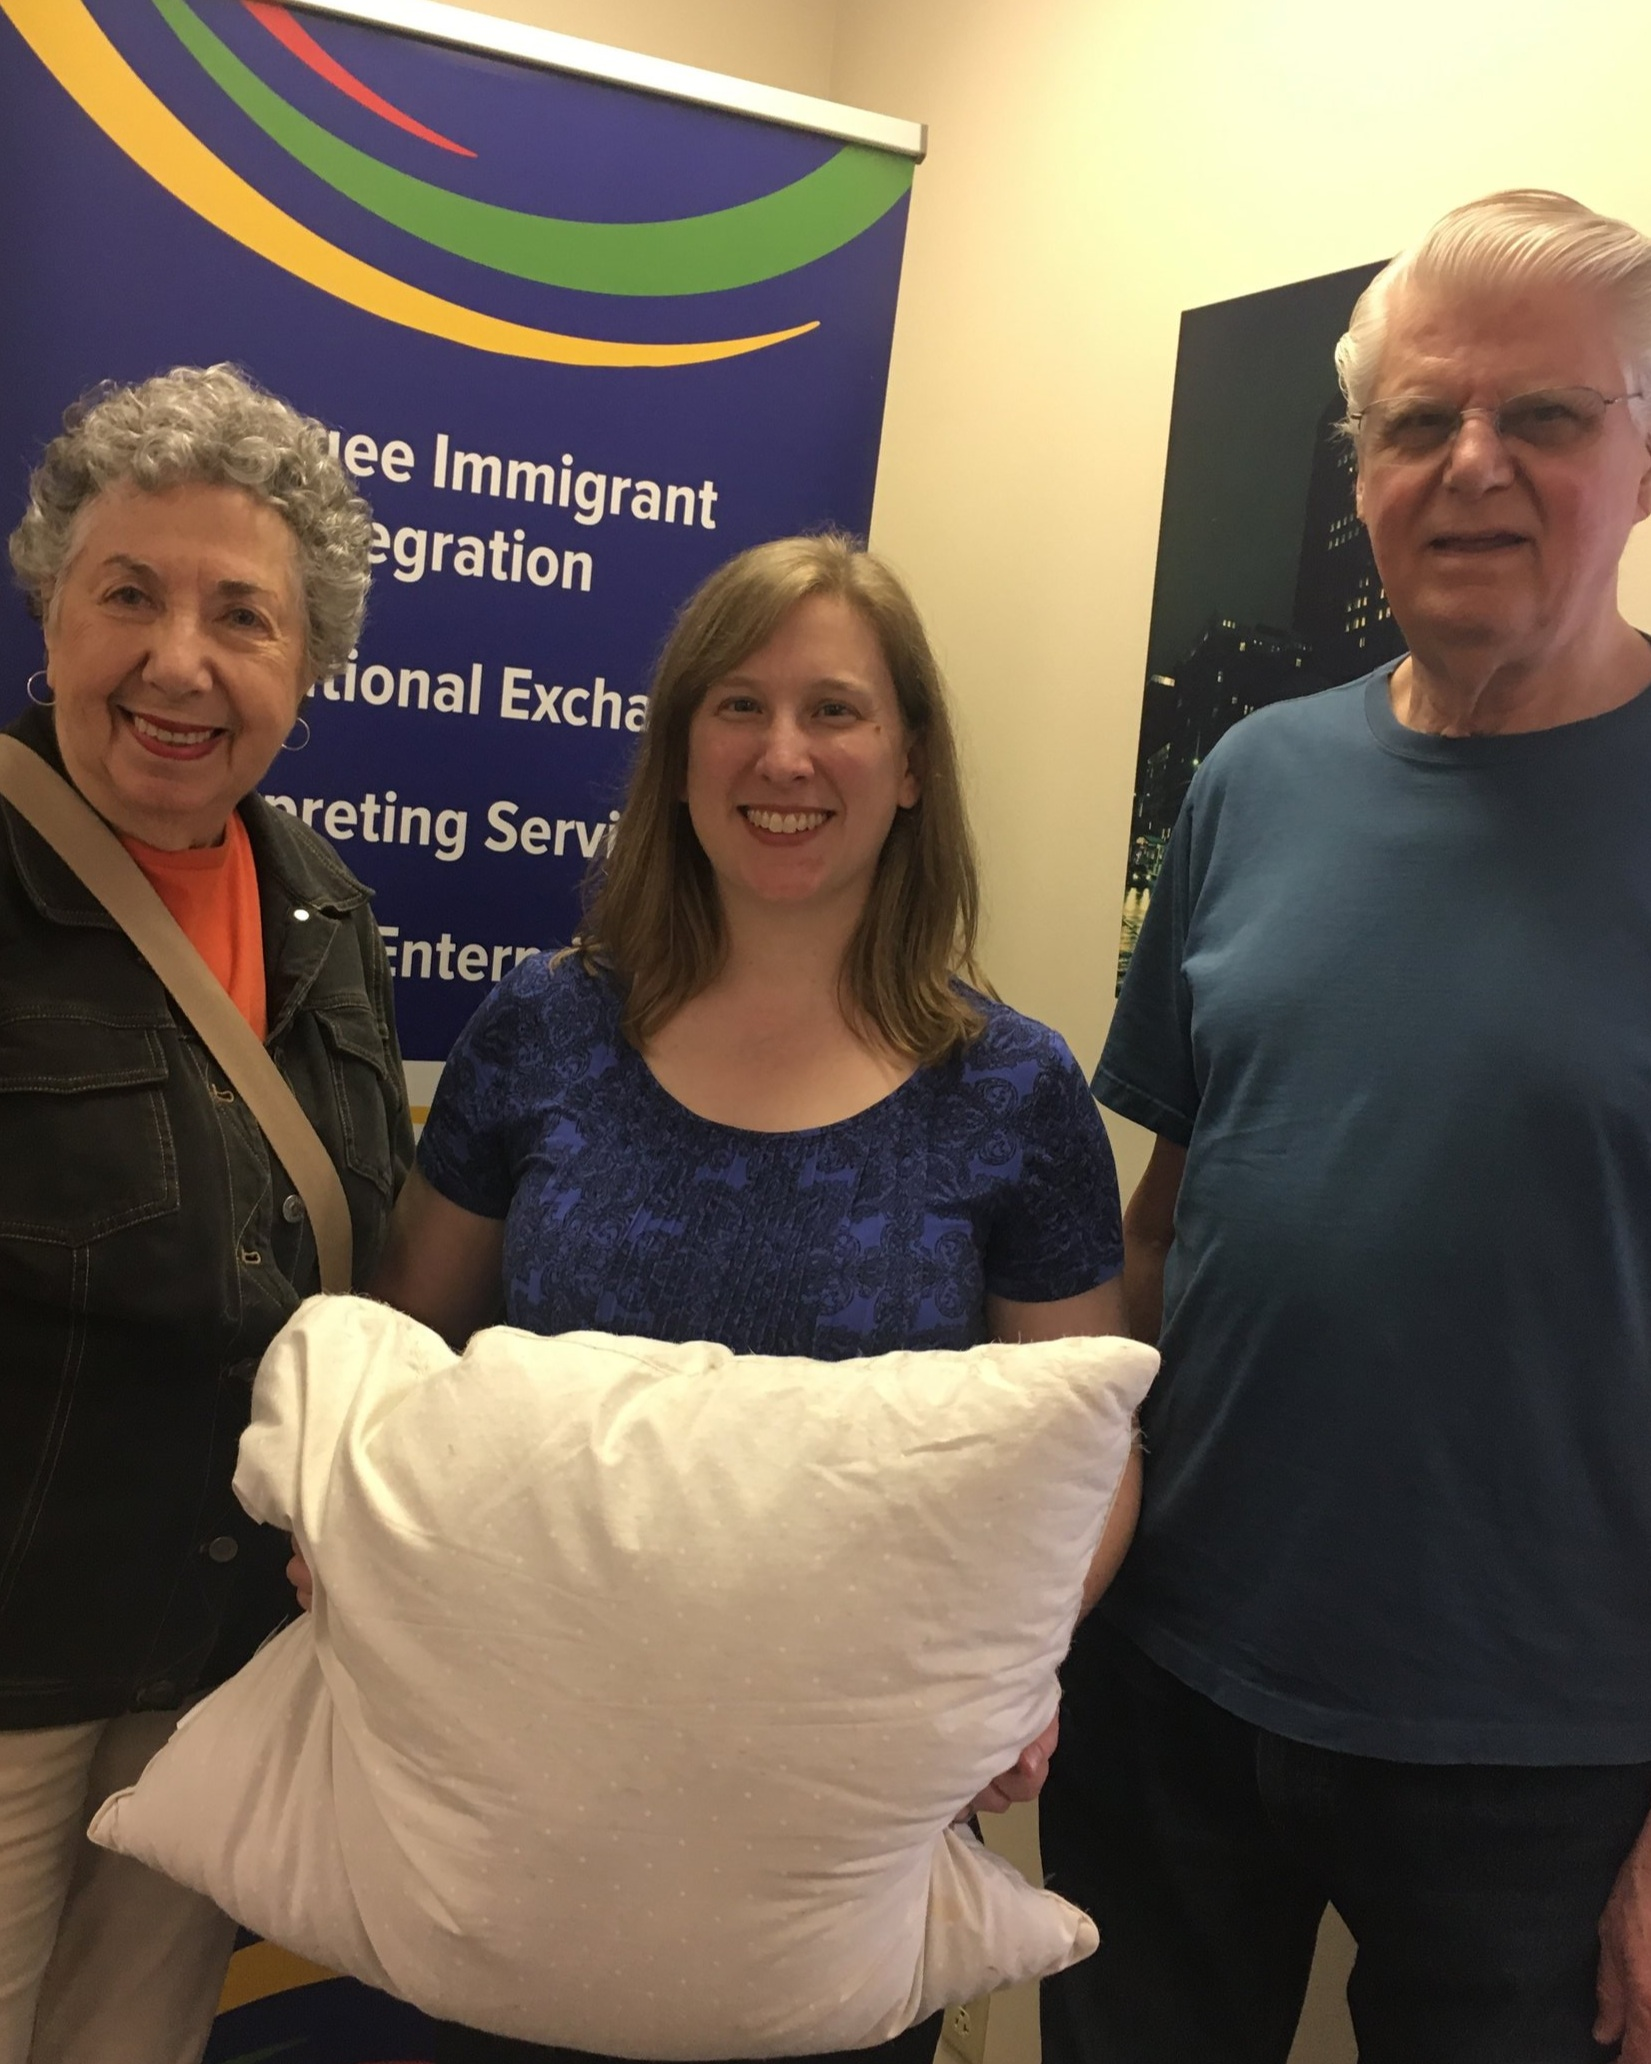 Roberta+and+Hans+Pillow+Donation.jpg